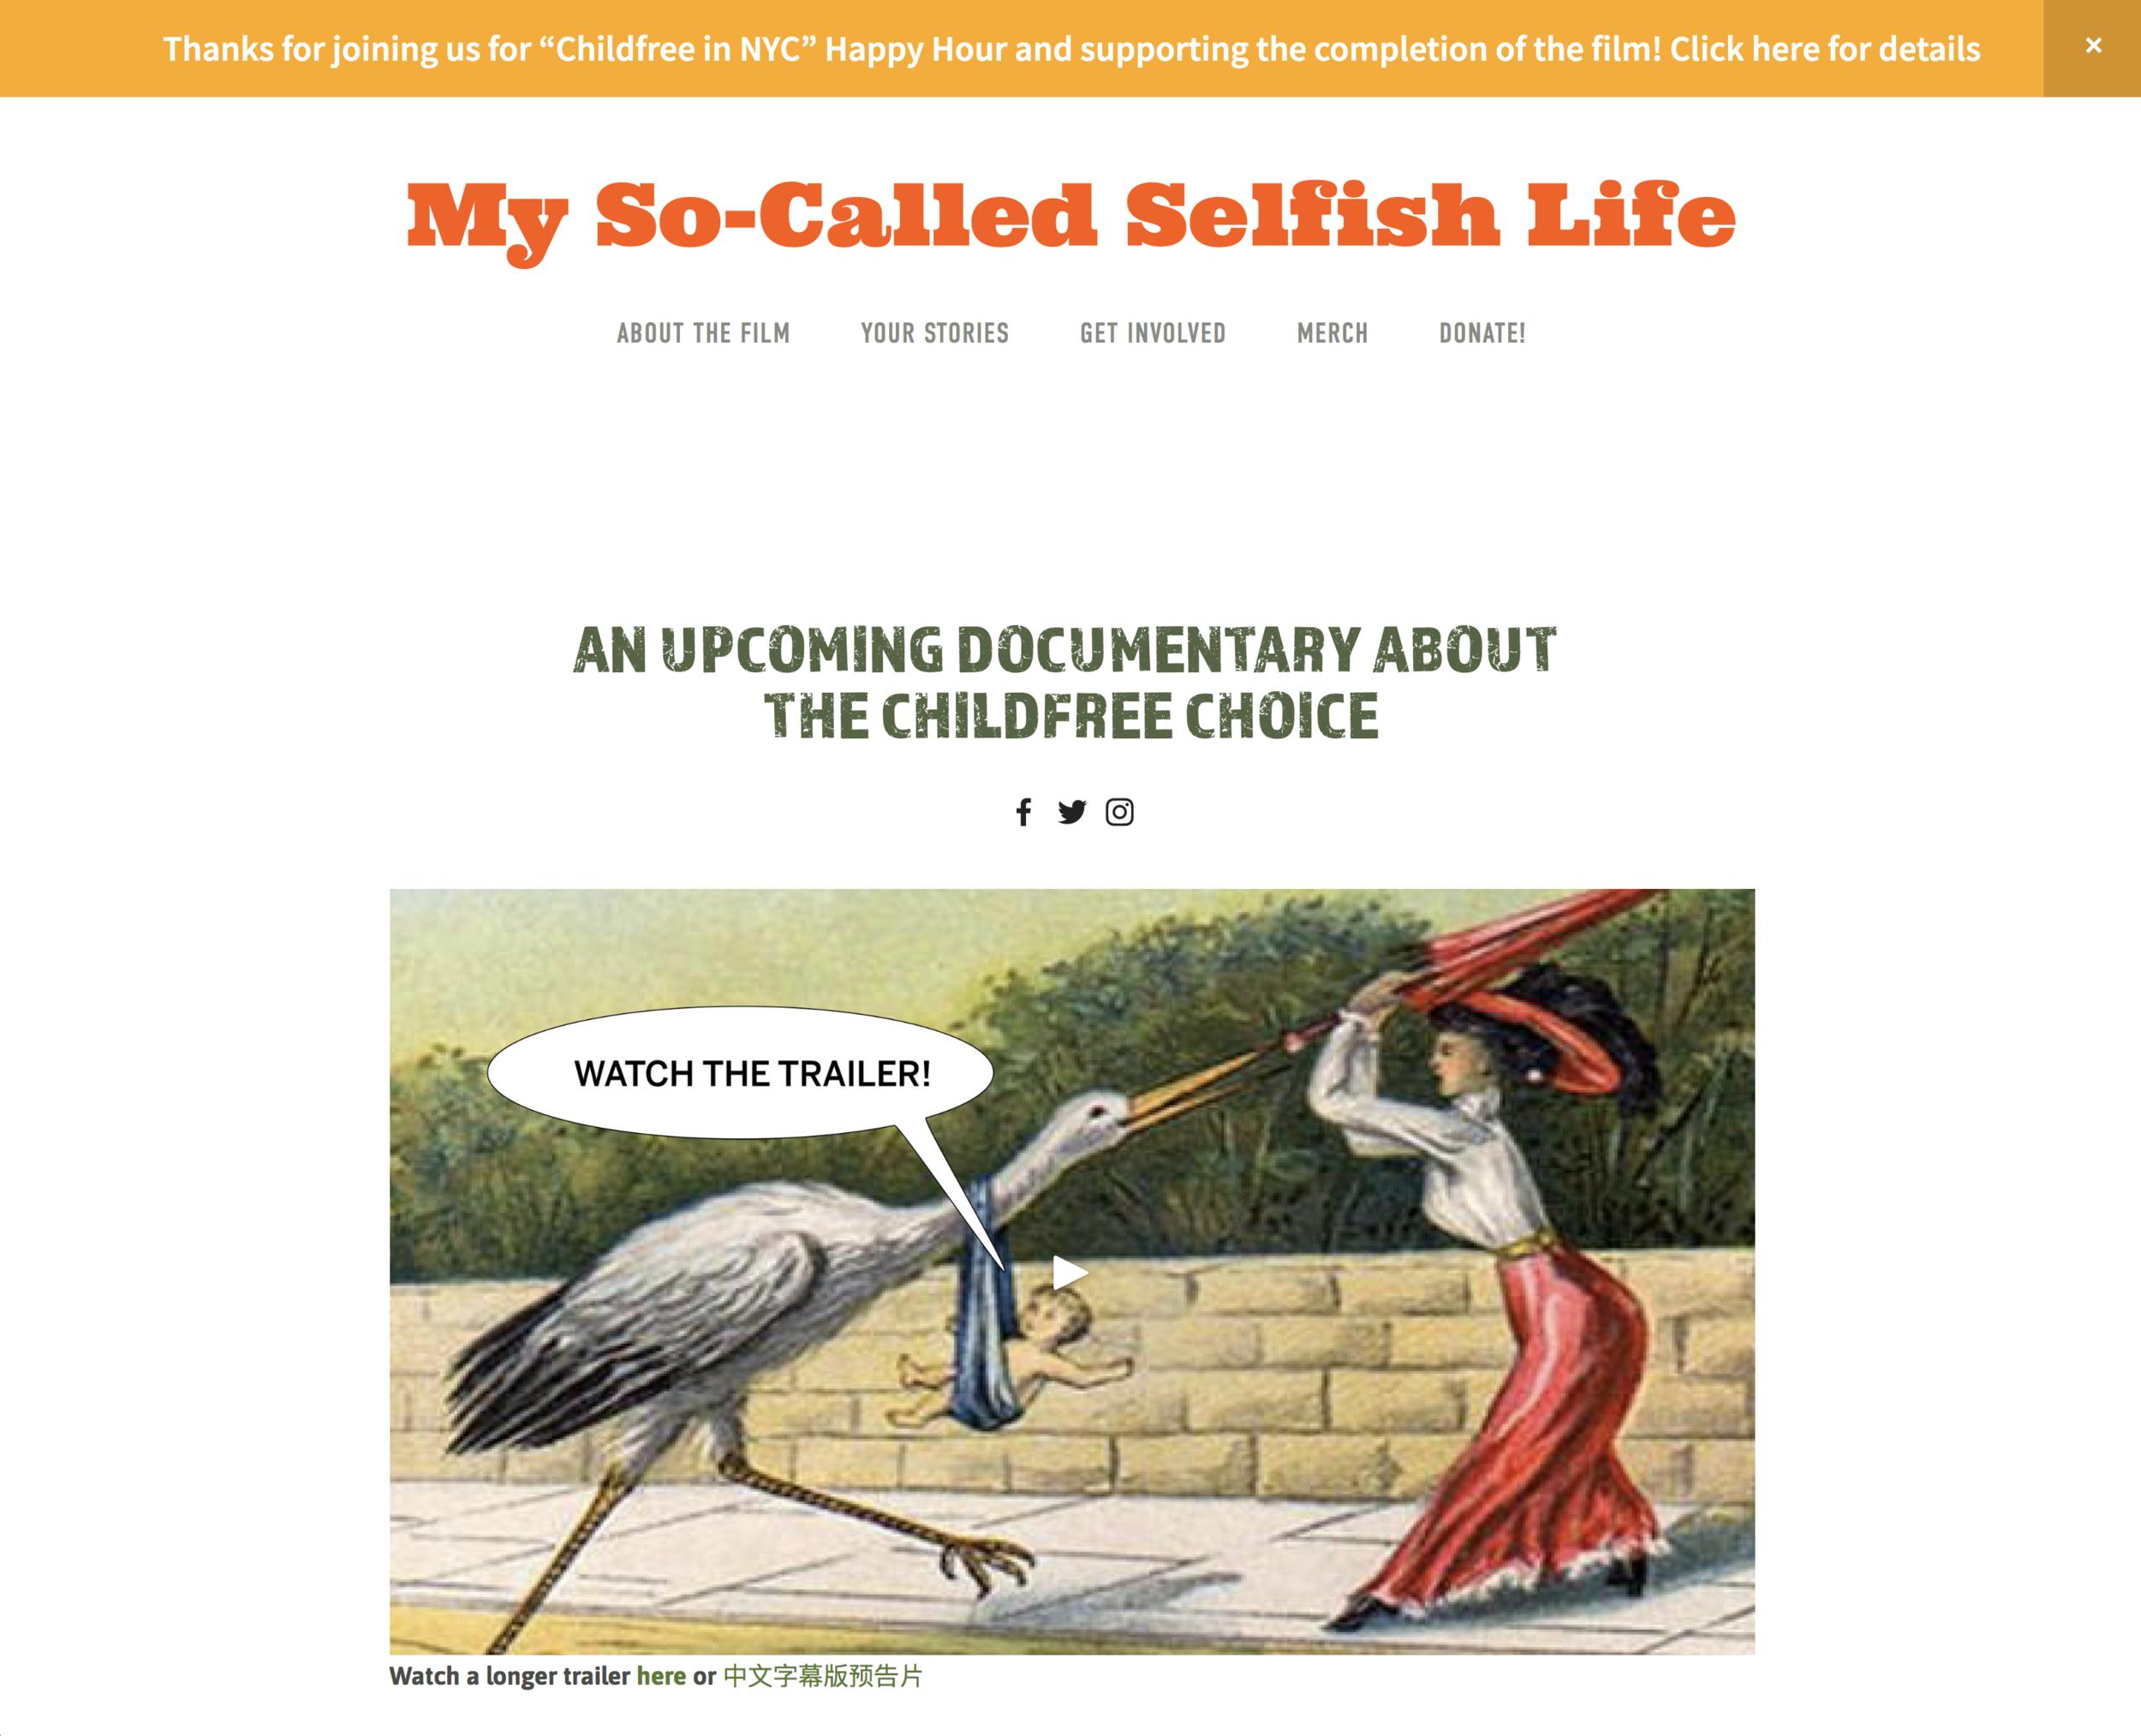 Website: My So-Called Selfish Life